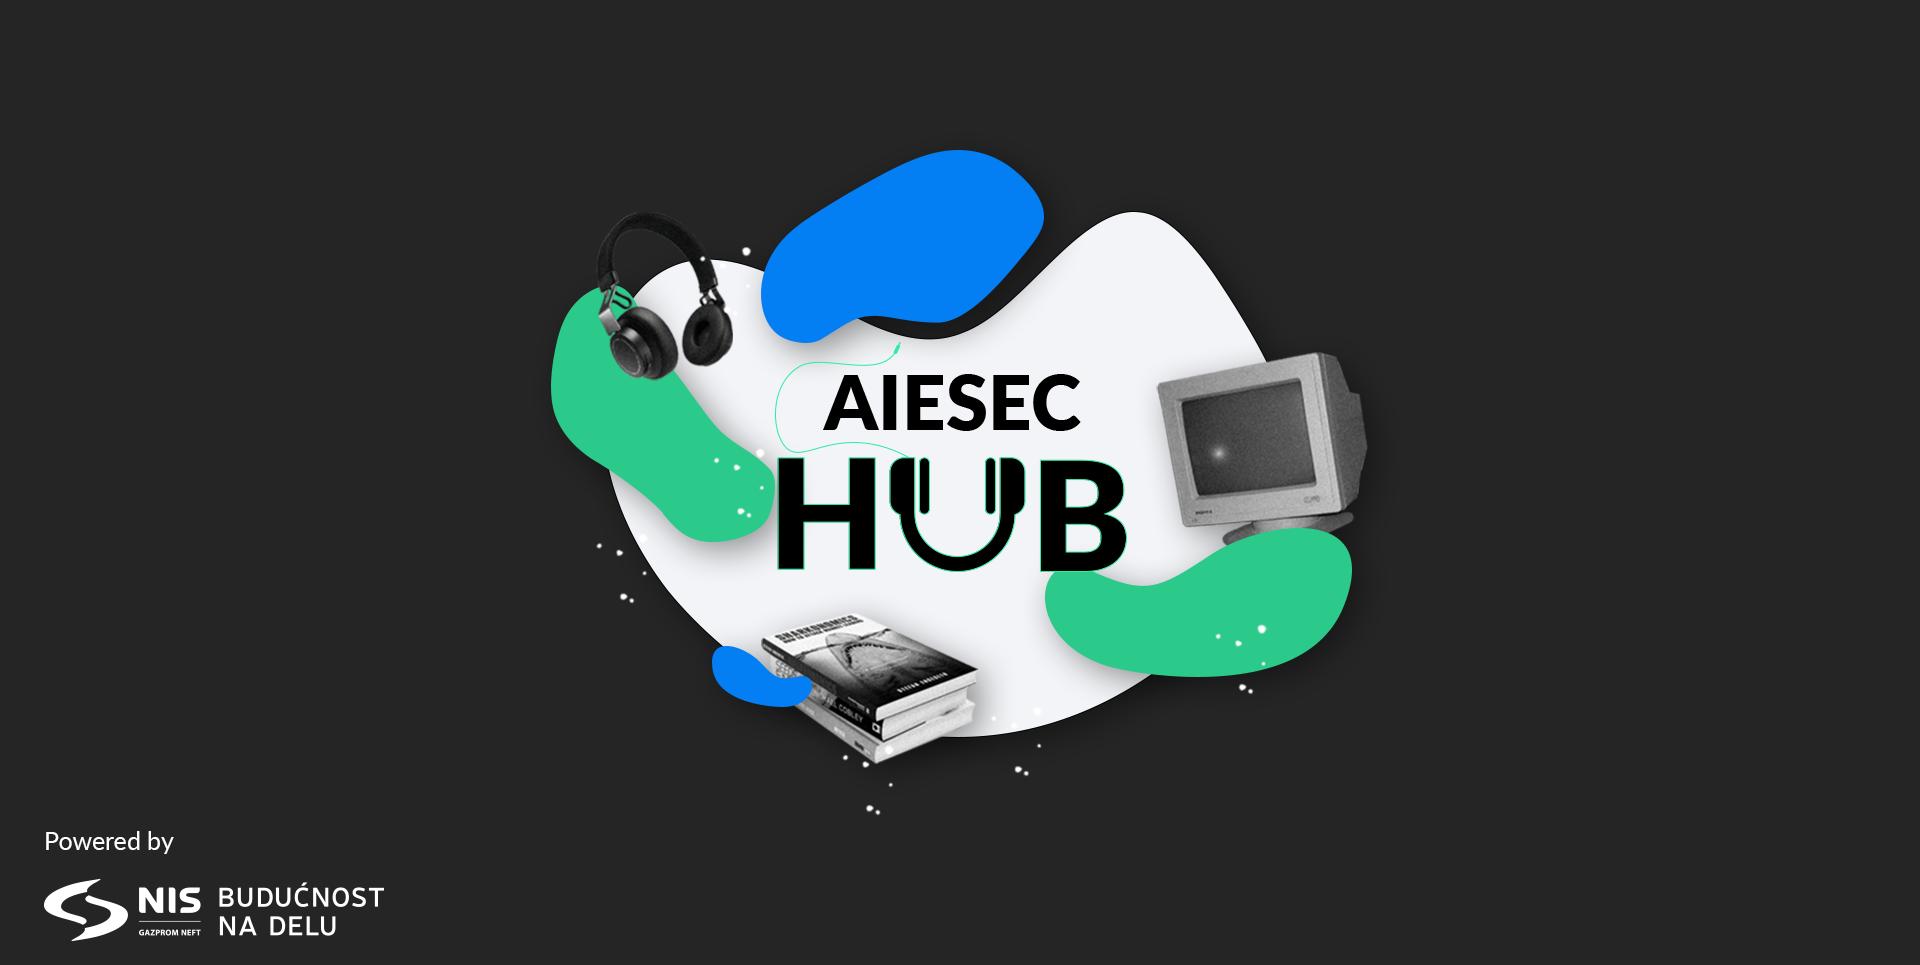 AIESEC HUB